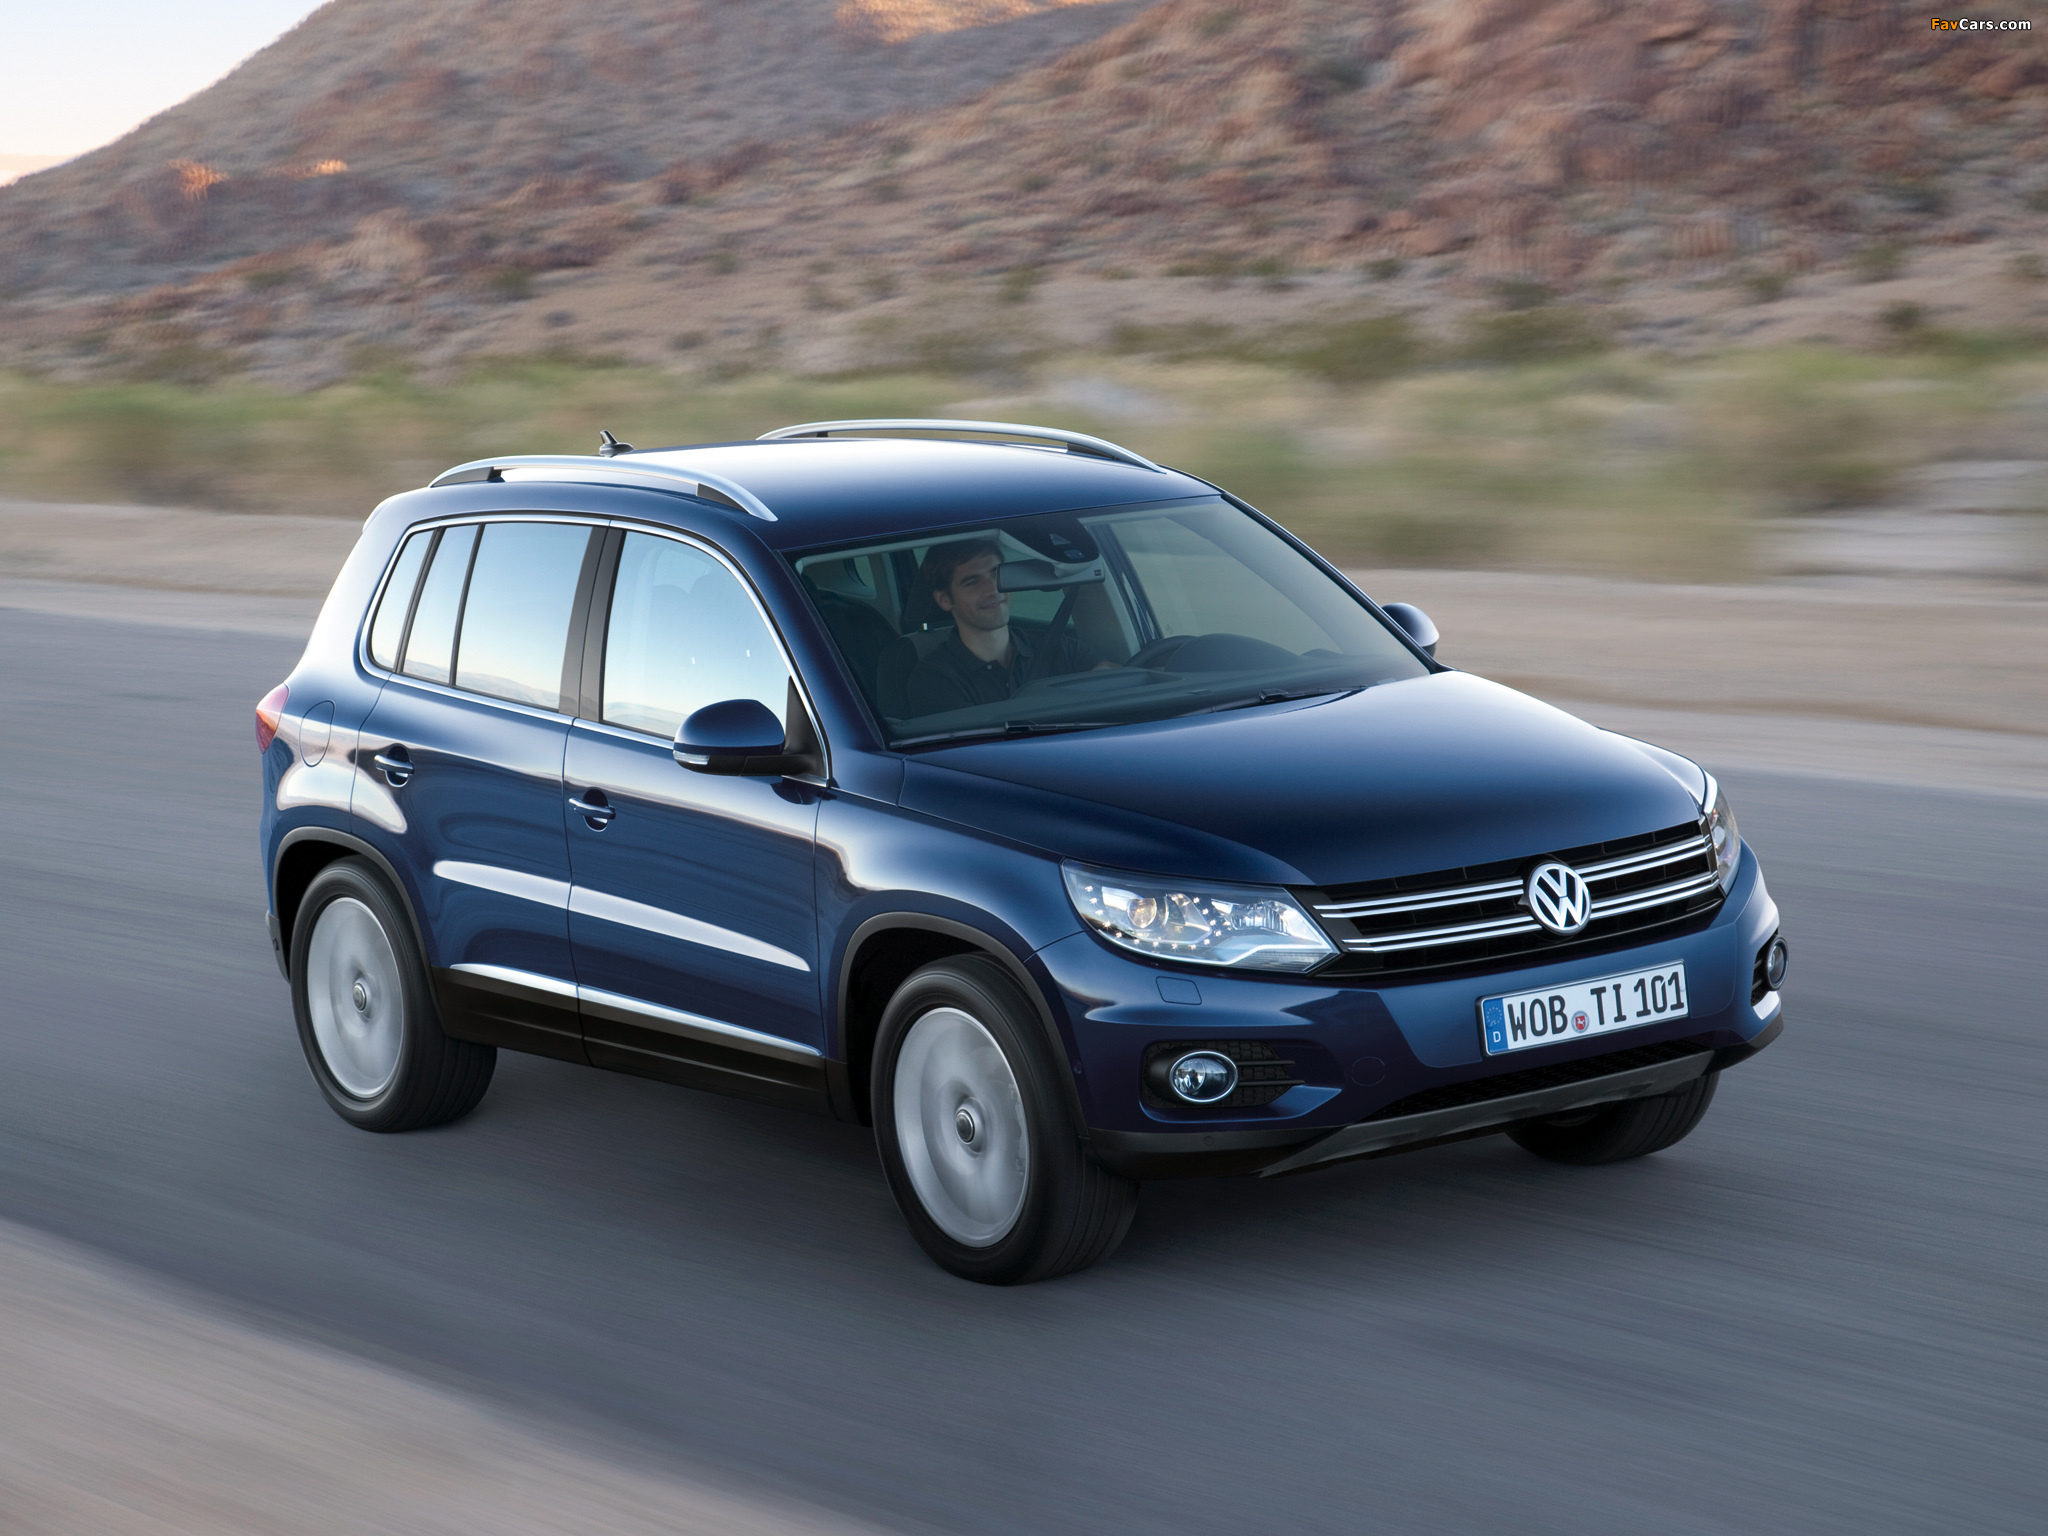 Volkswagen Tiguan Track & Style 2011 images (2048 x 1536)